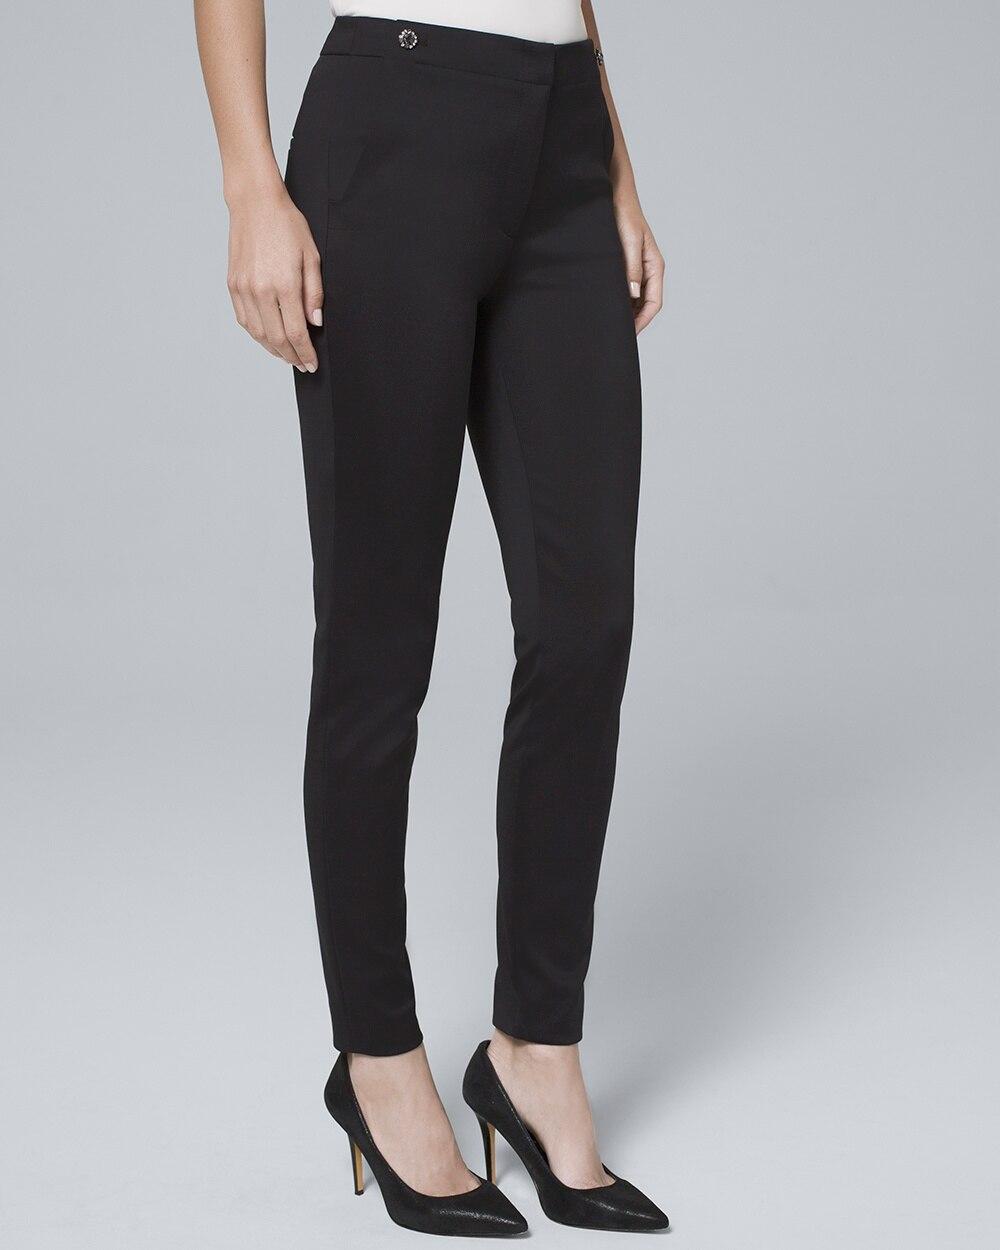 d200e2c4d7591 Embellished-Button Satin Slim Ankle Pants - White House Black Market